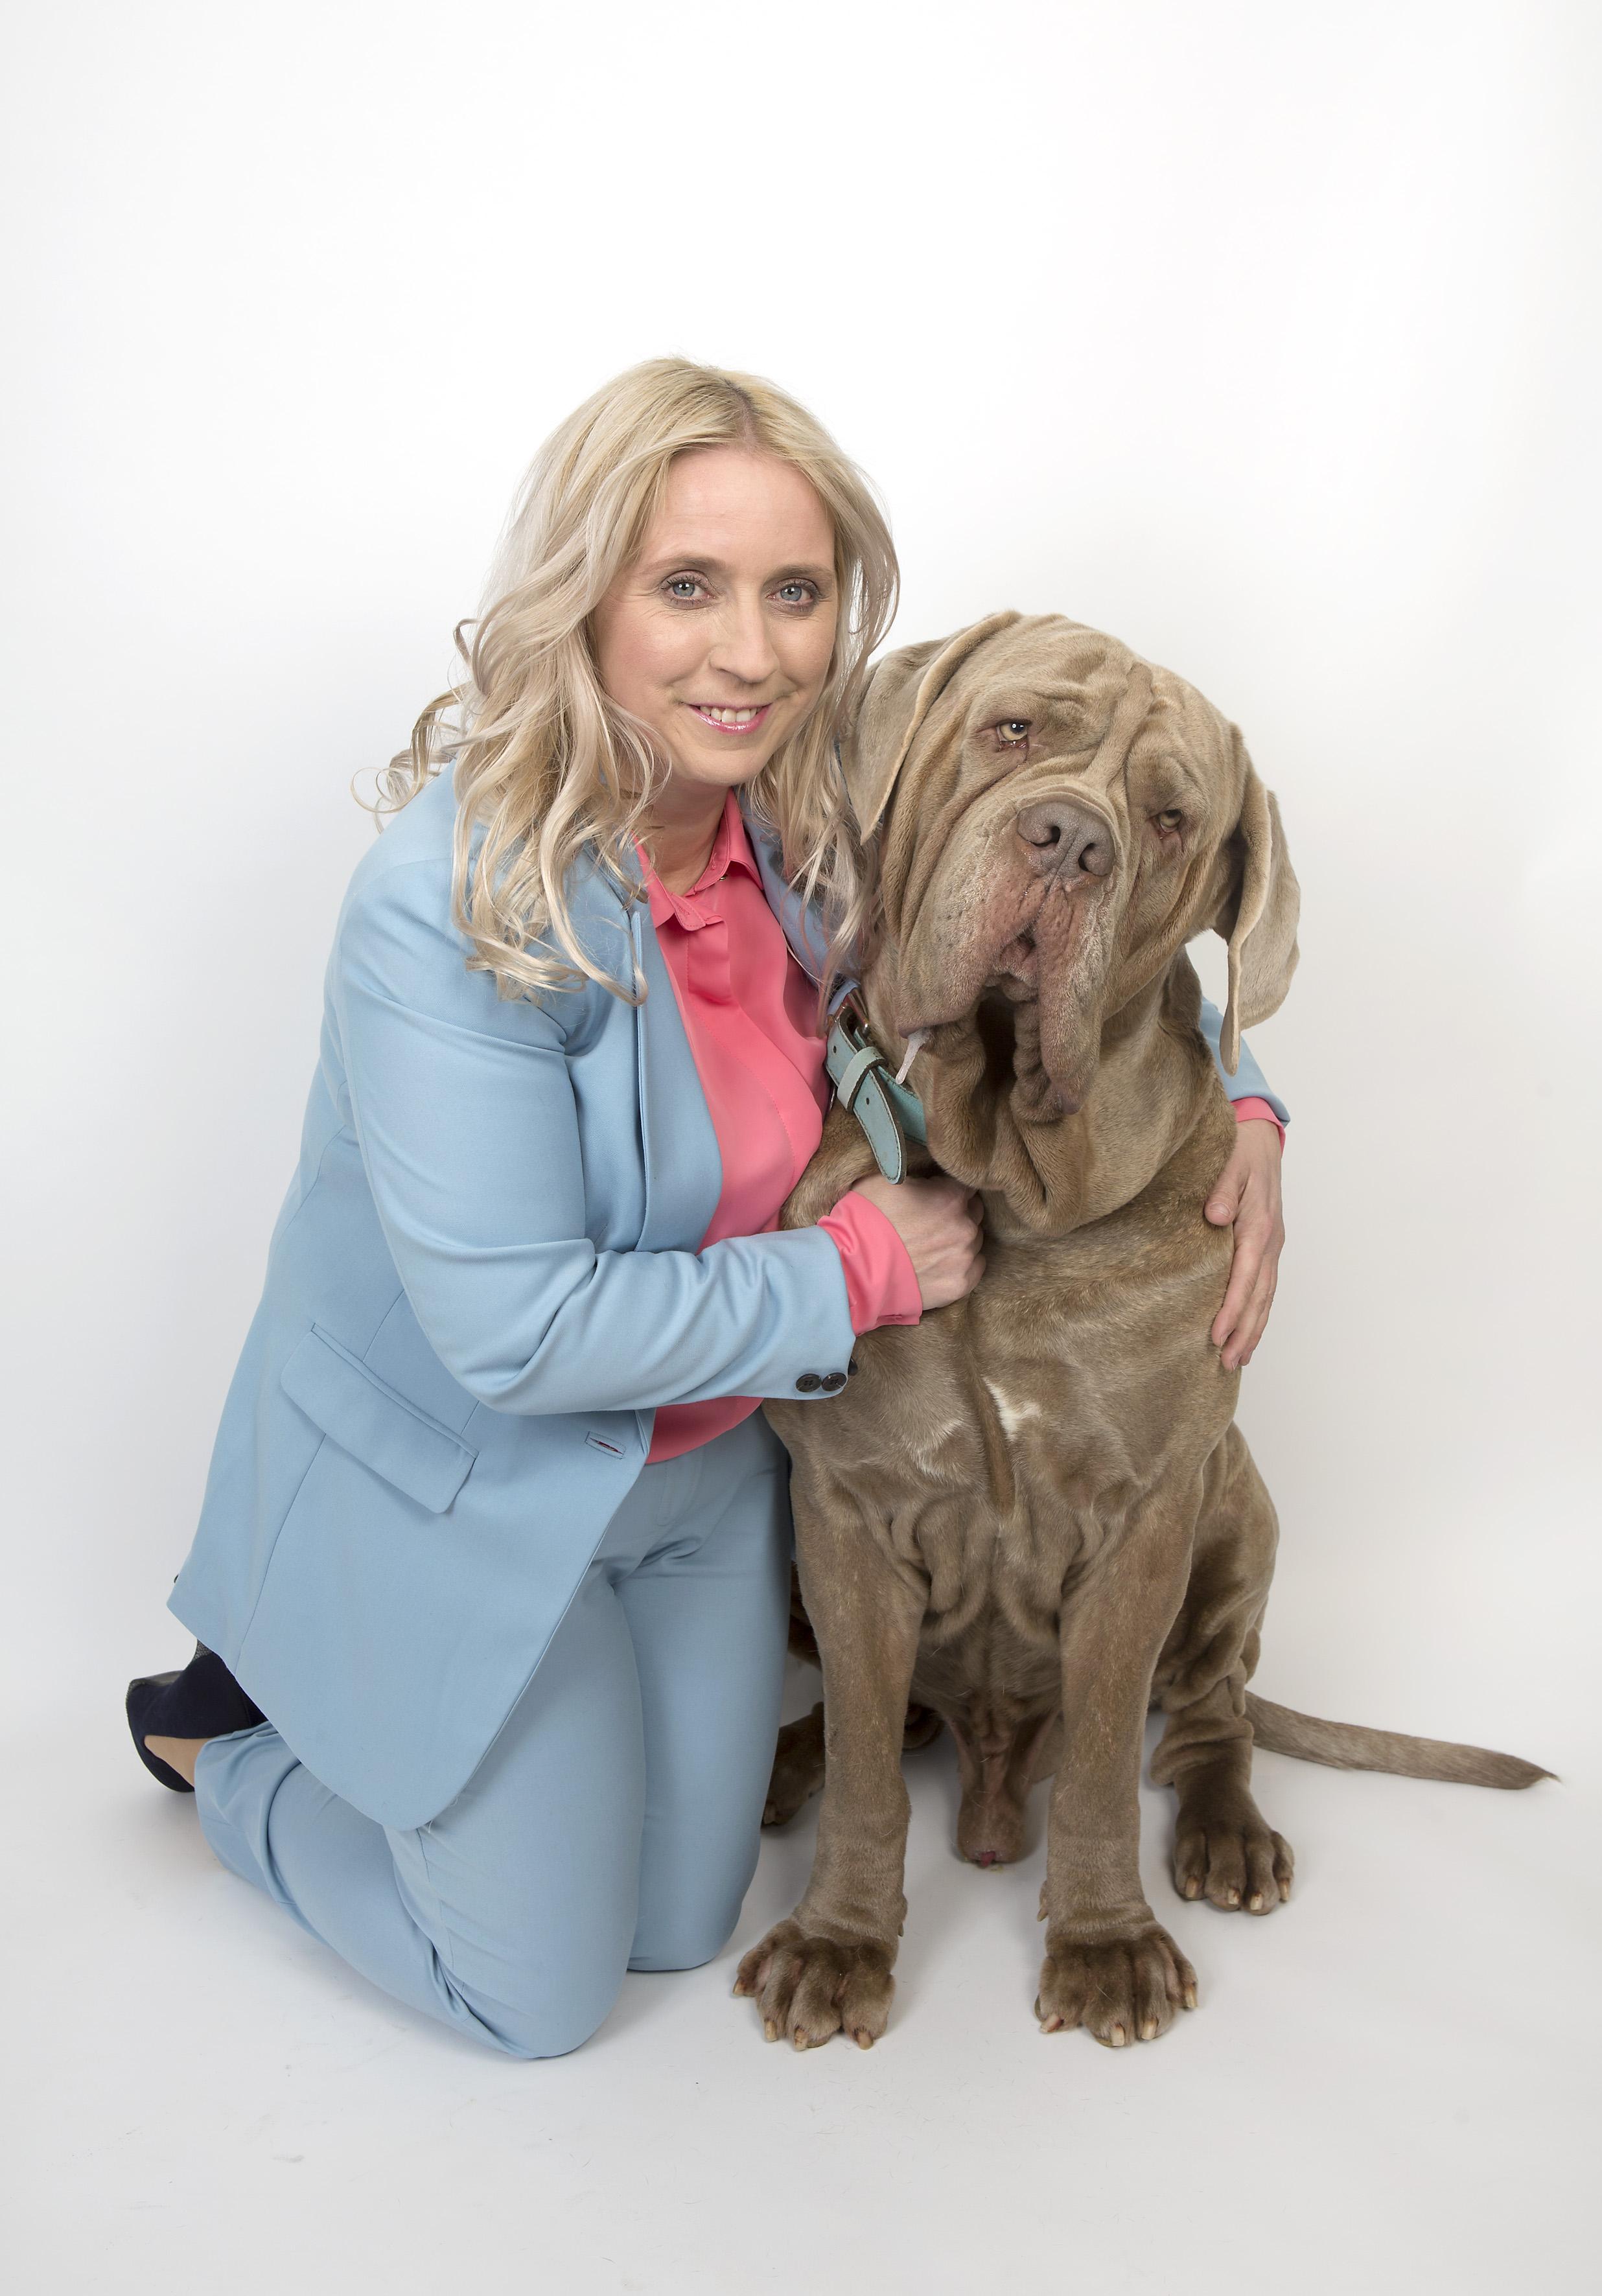 http://www.dailymail.co.uk/femail/article-5428417/Massive-mutts-fashion-years-handbag-dogs.html